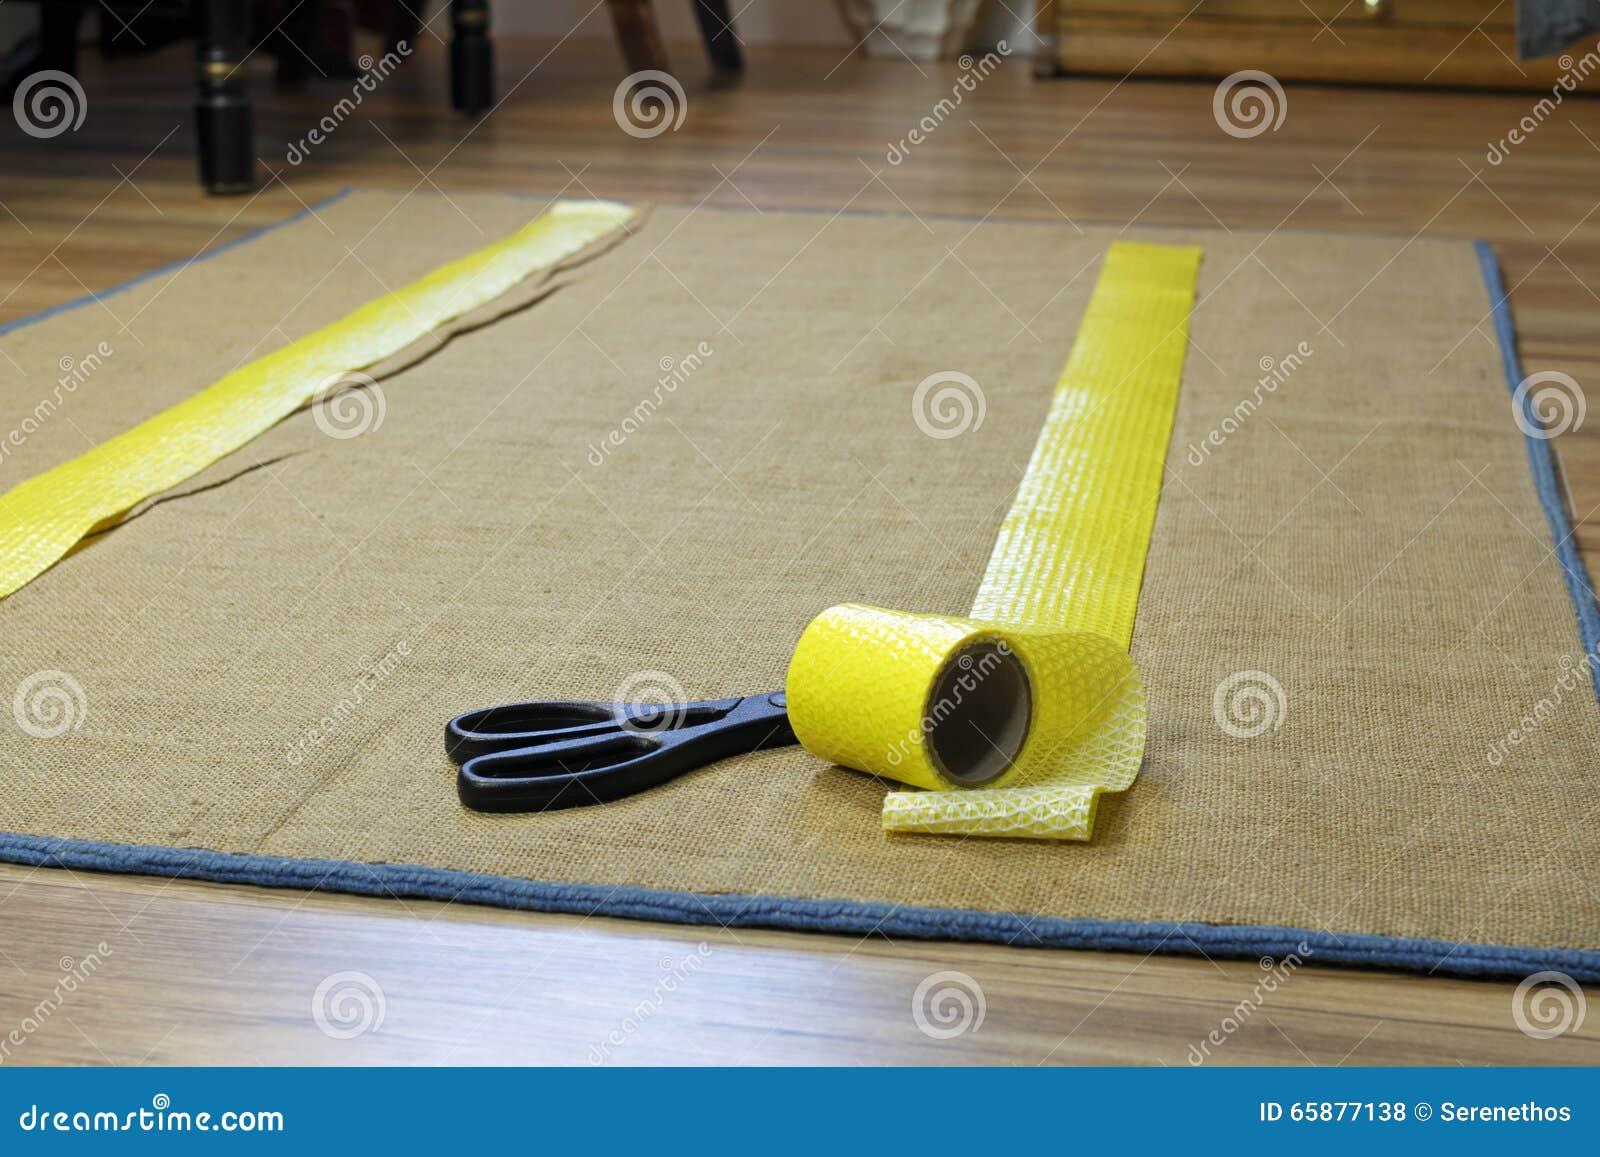 Anti Slip Rug Tape And Scissors Stock Photo Image 65877138